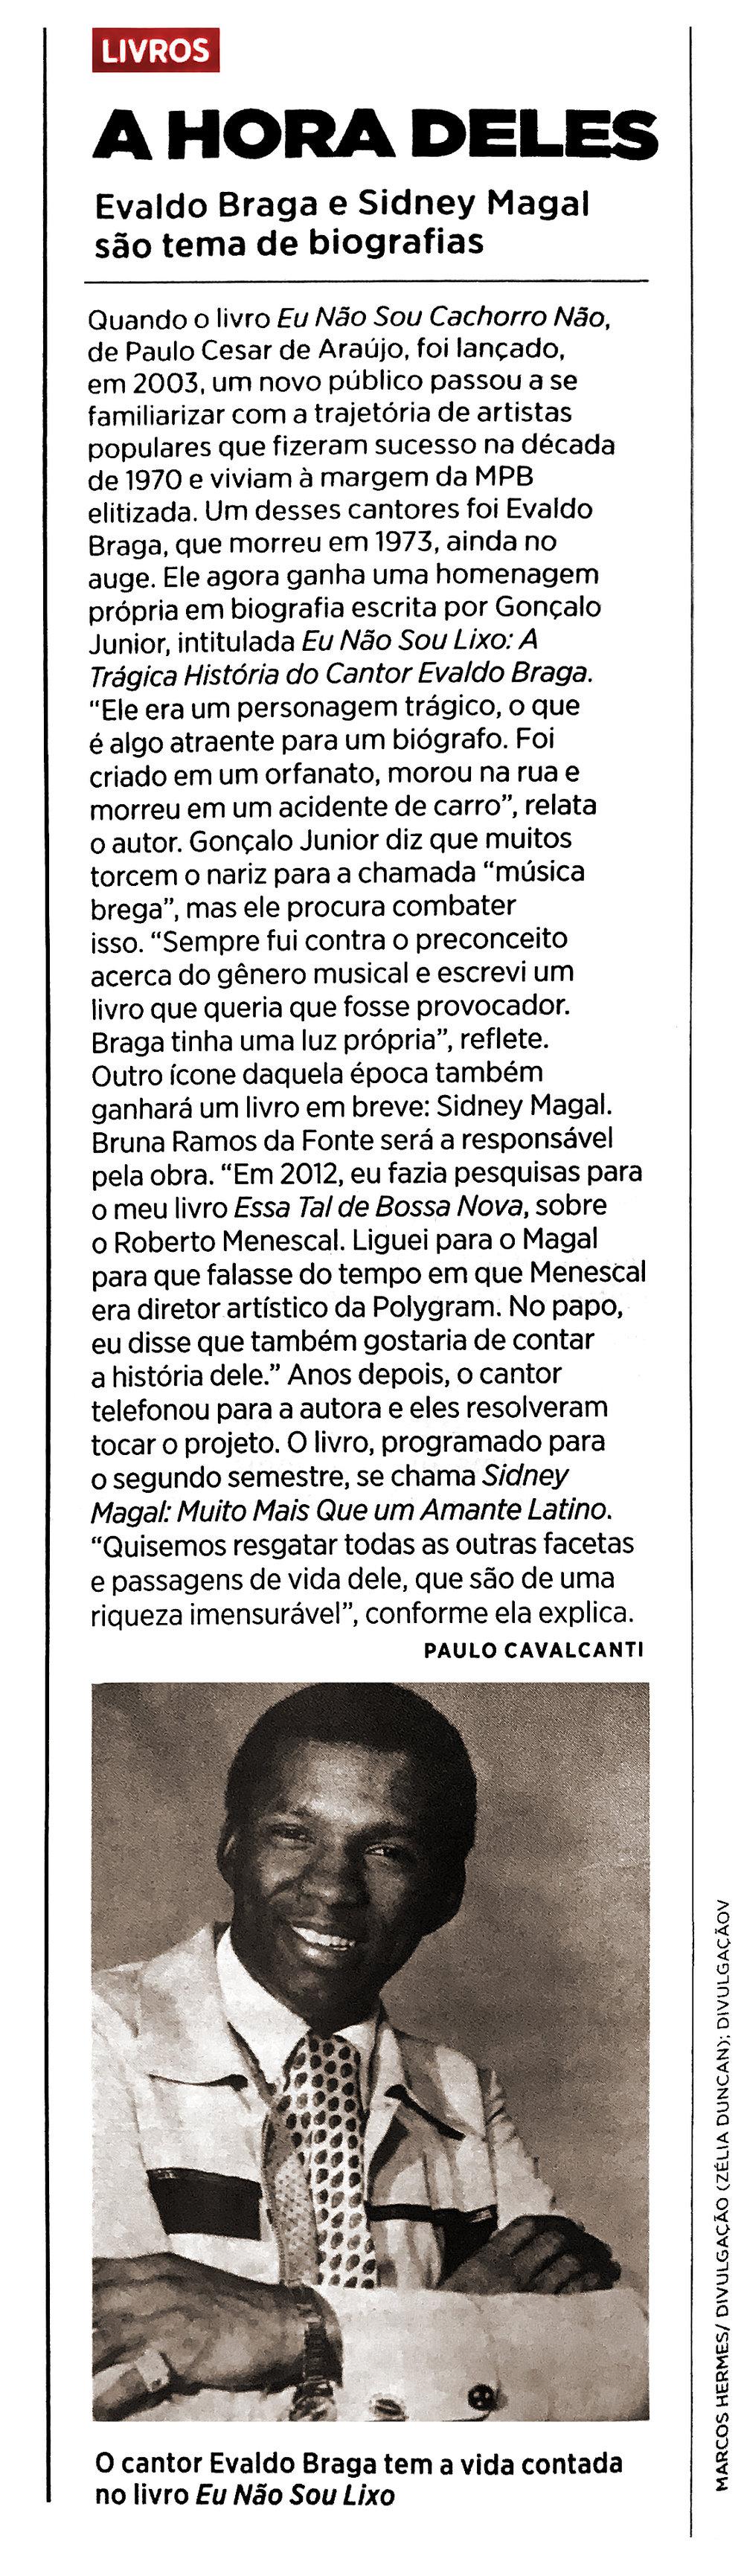 Rolling Stones São Paulo –23/6/17